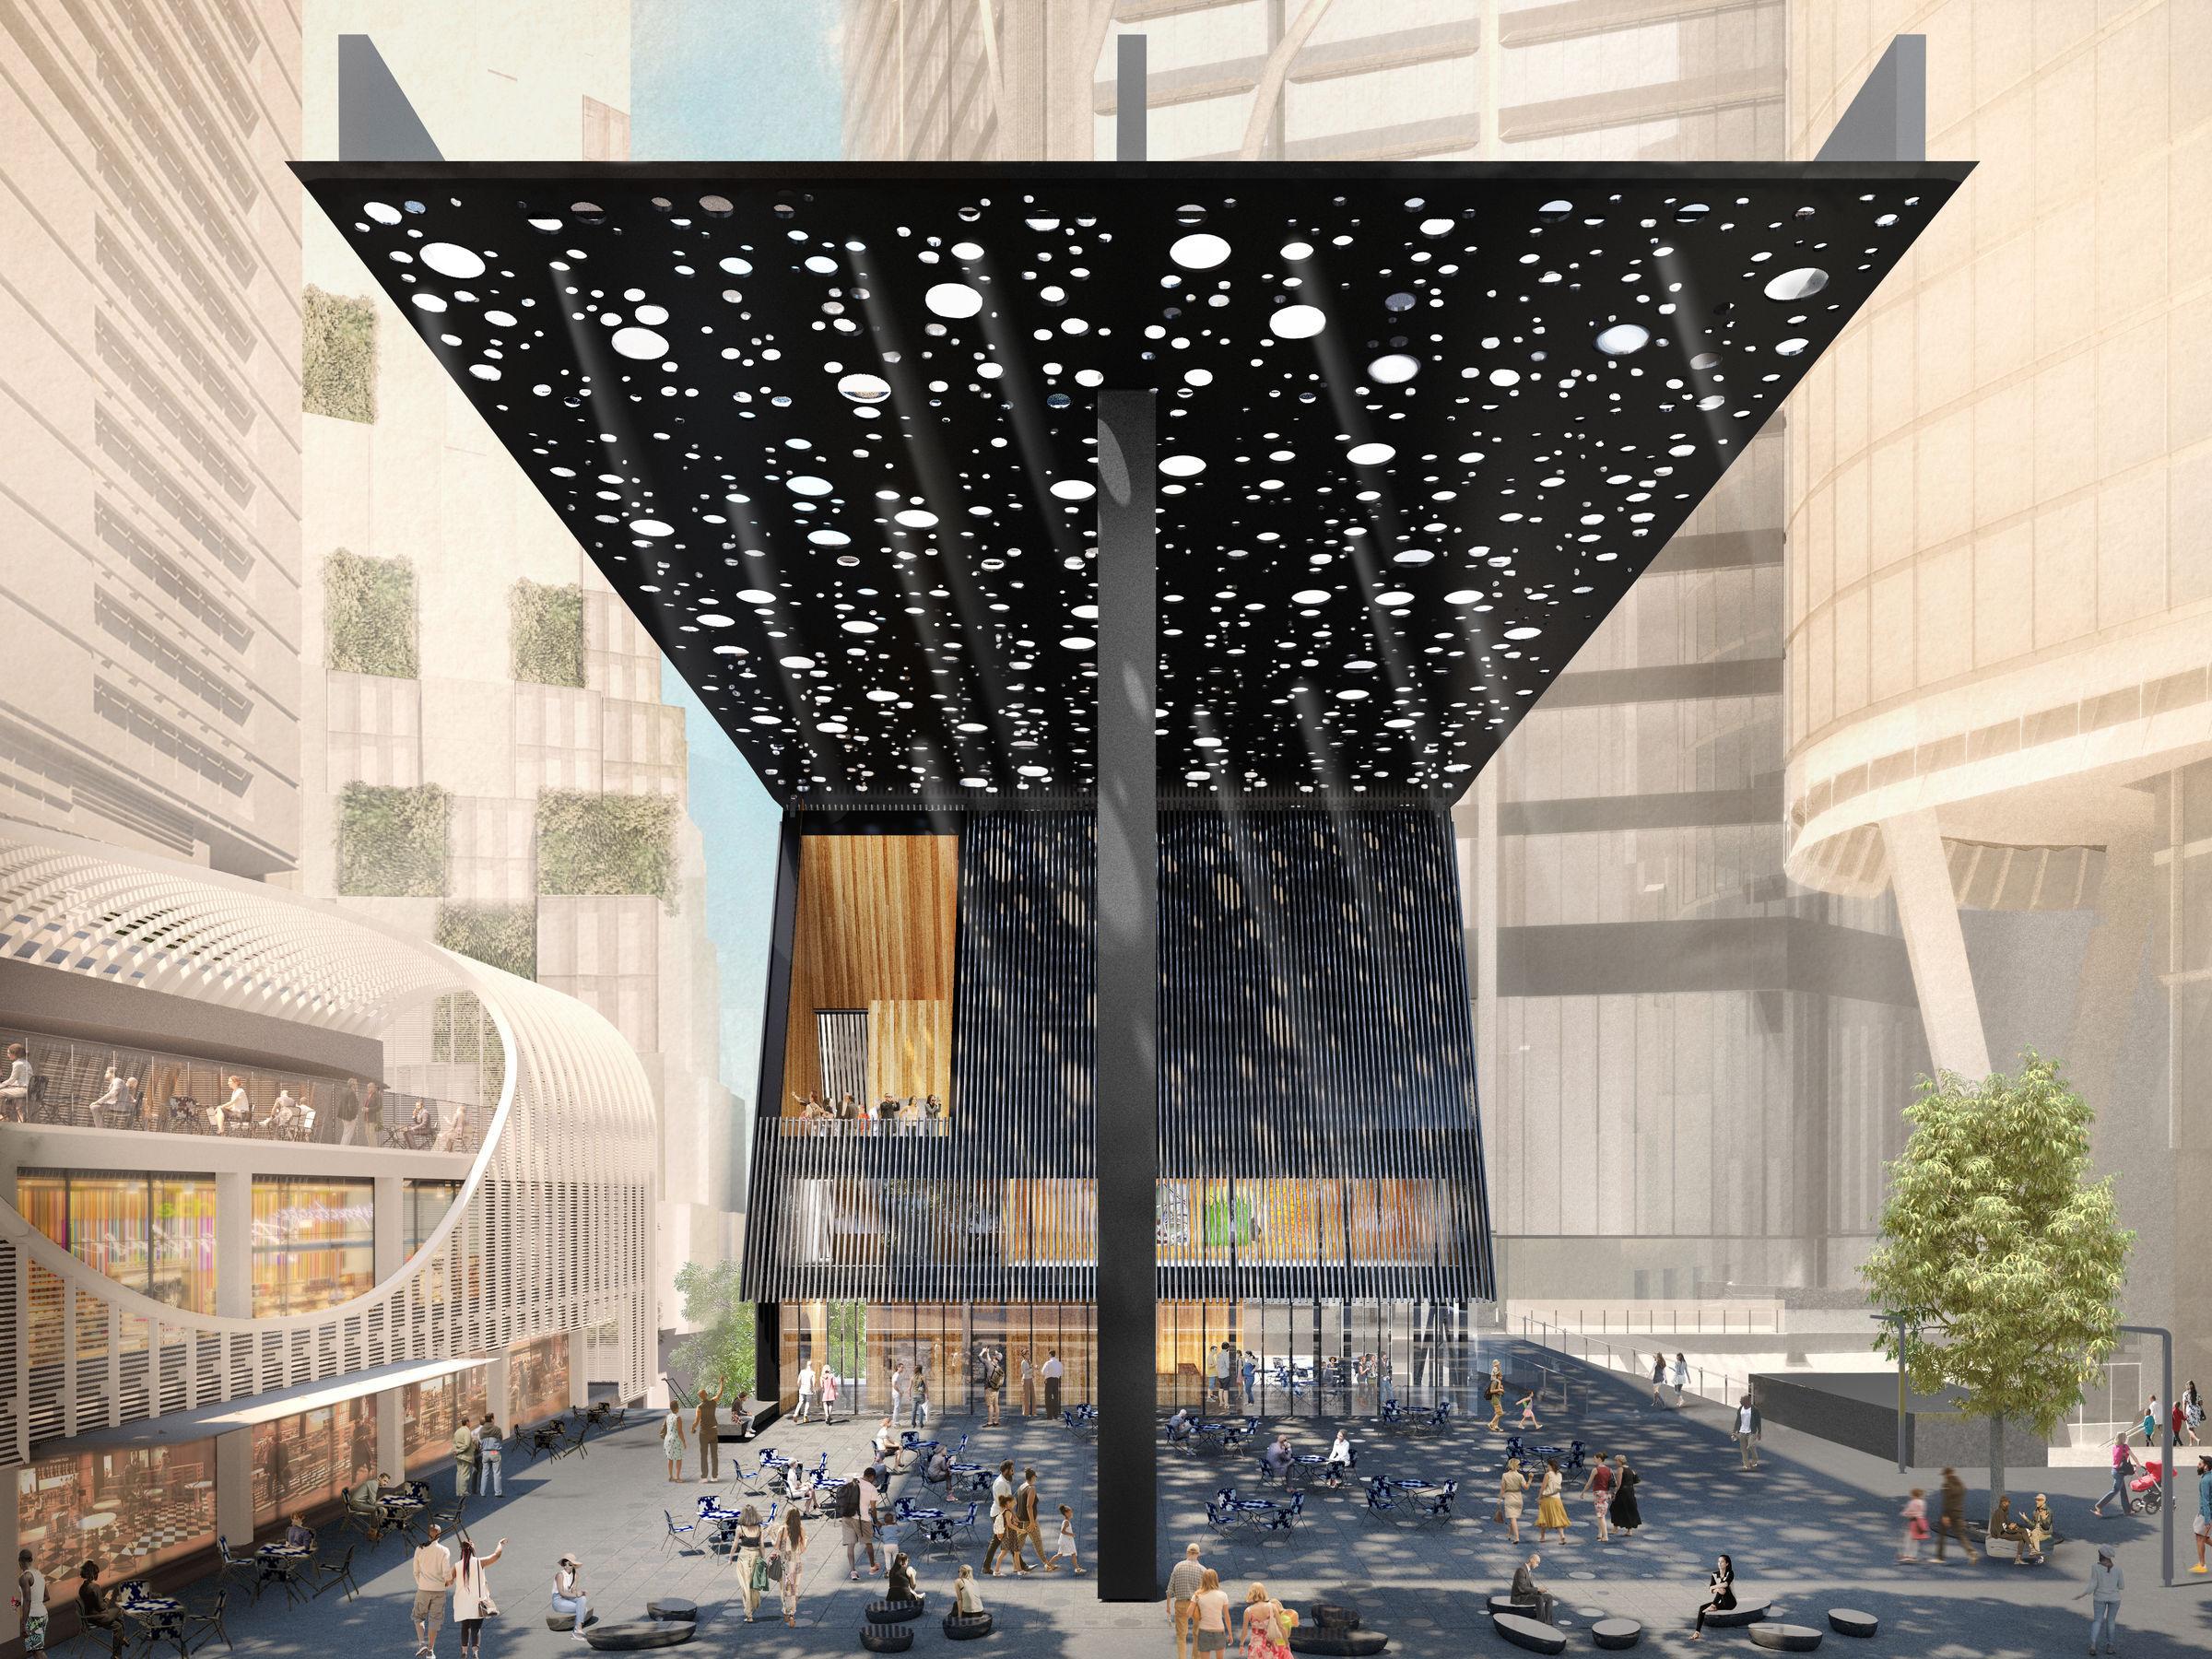 adjaye david plaza sydney associates architecture canopy sir boyd daniel perforated obe gold royal circular giant plans awarded medal 2021